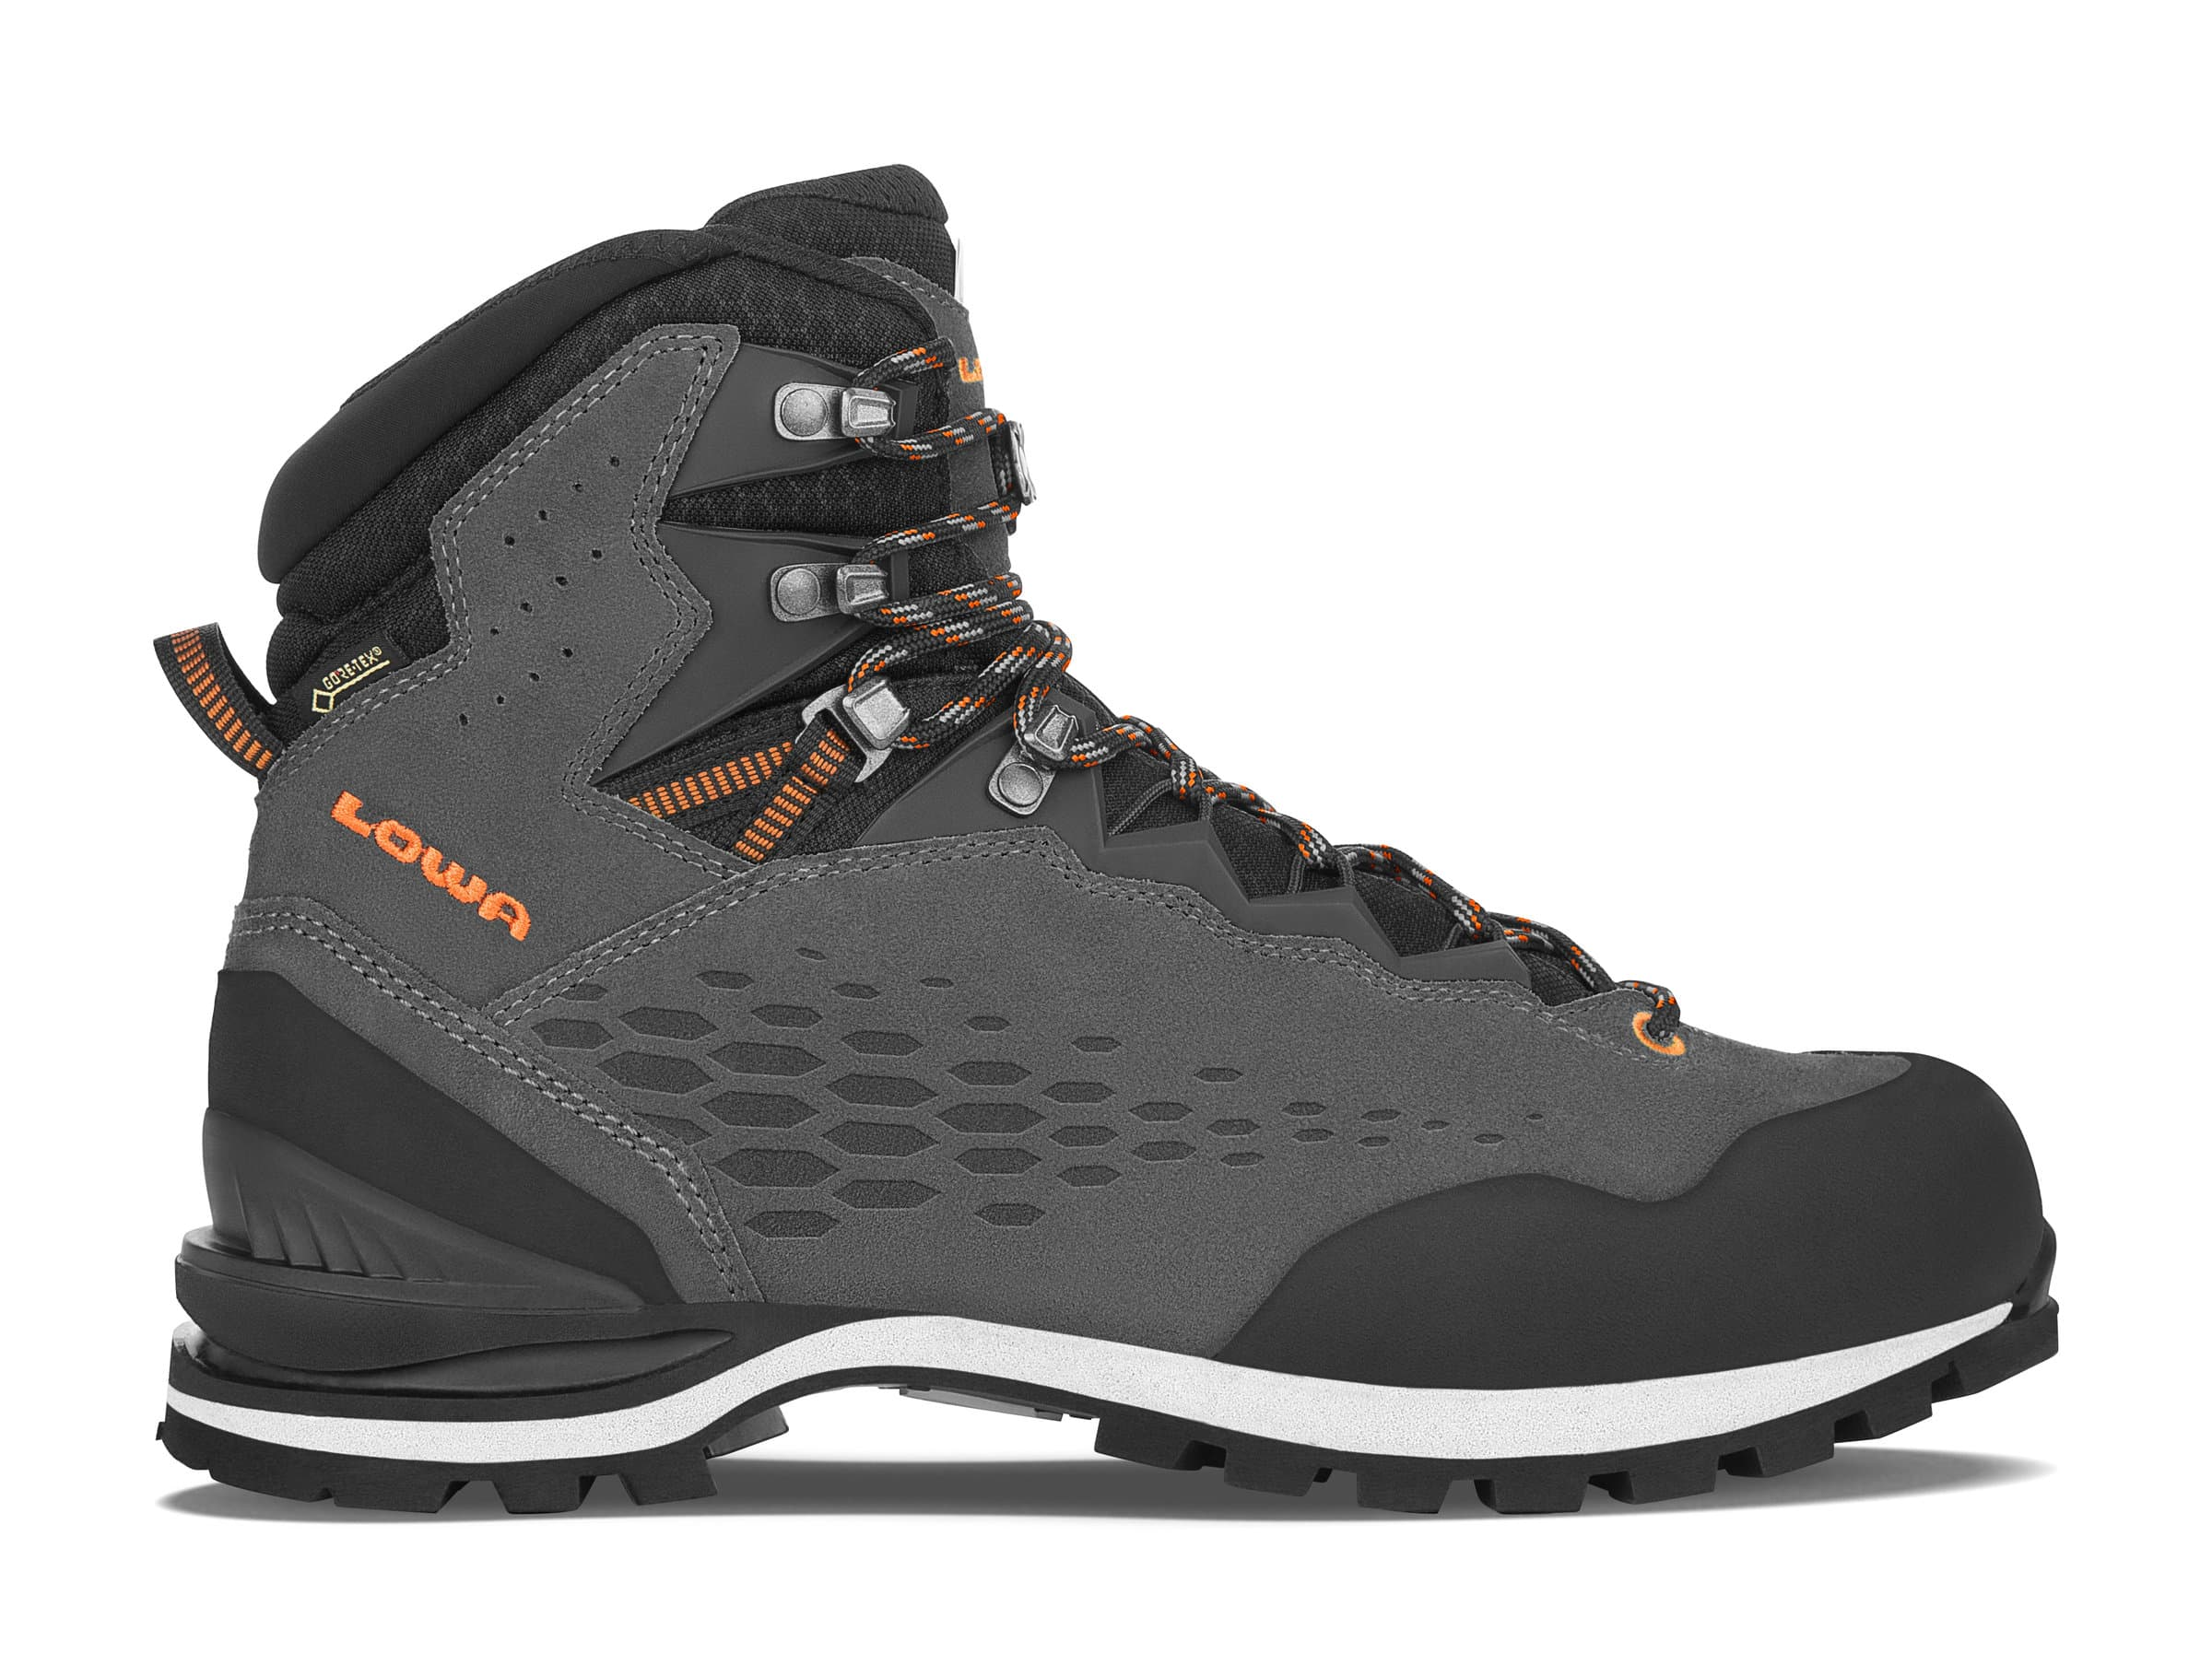 Lowa Cadin GTX Mid Chaussures de trekking unisexe